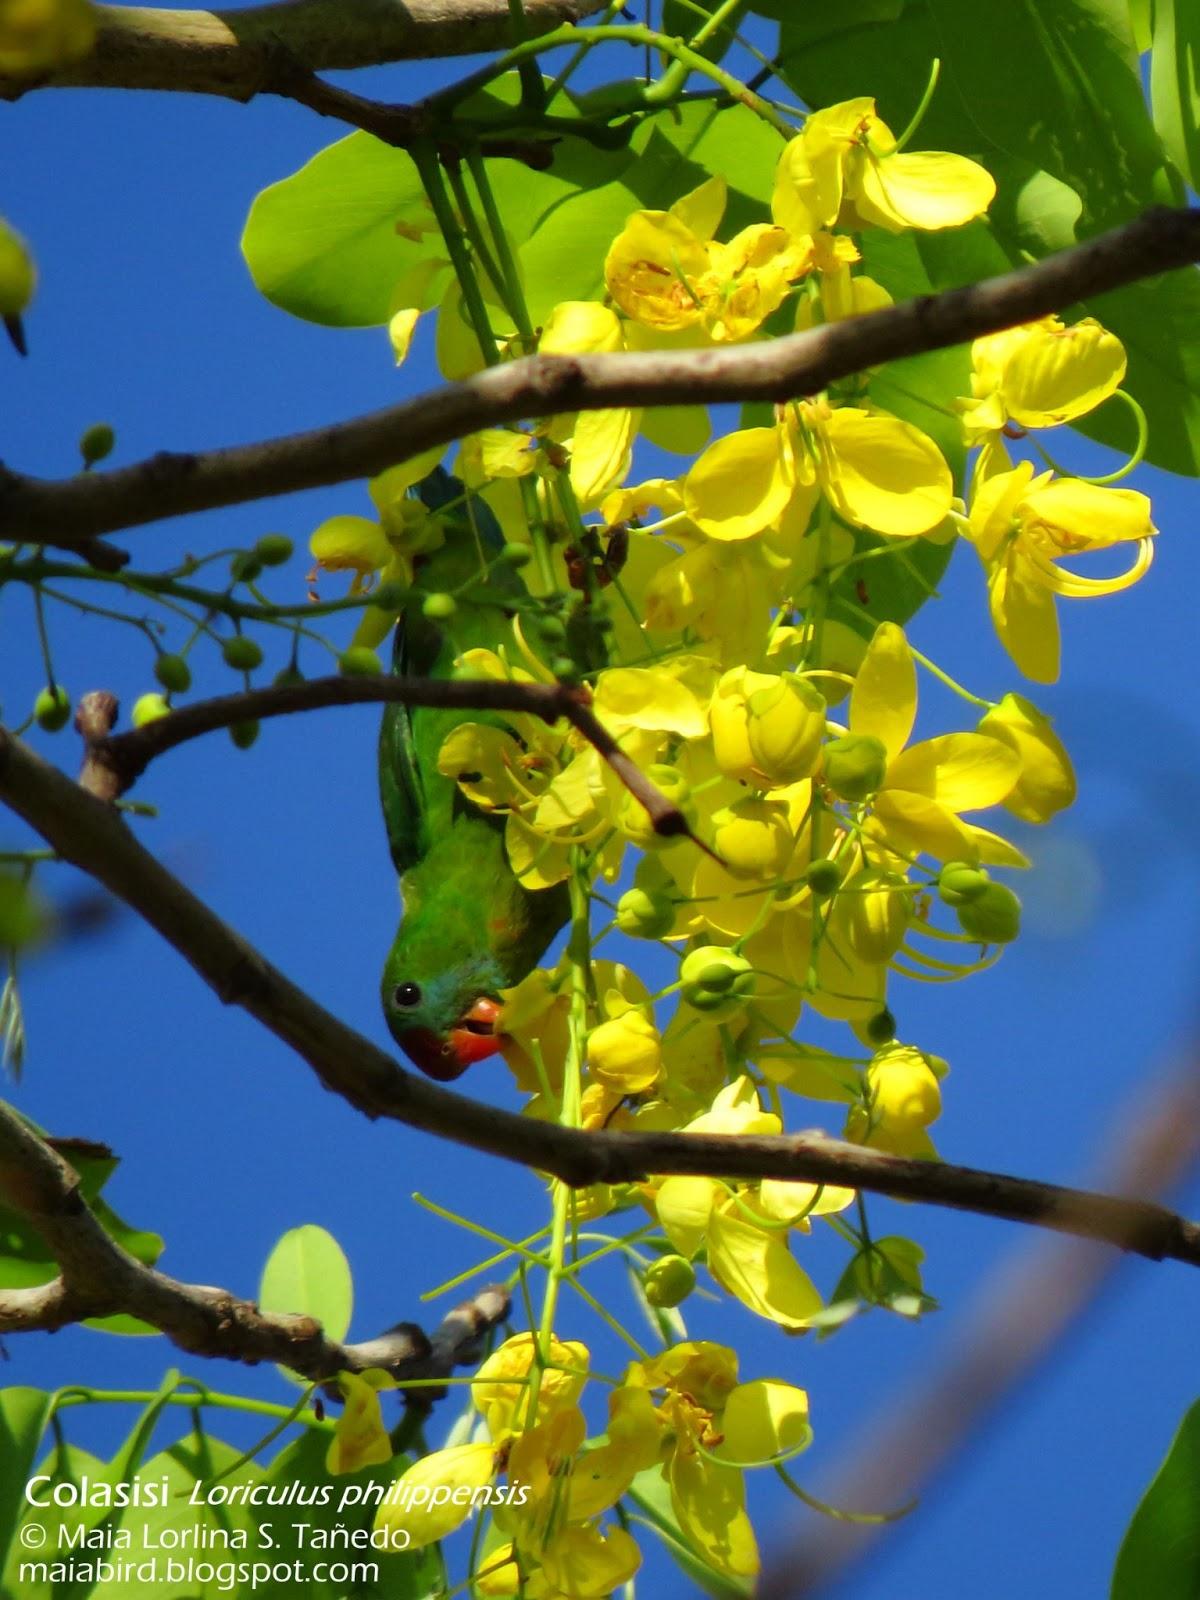 Maiabirds Brain Green Bird And Yellow Flowers